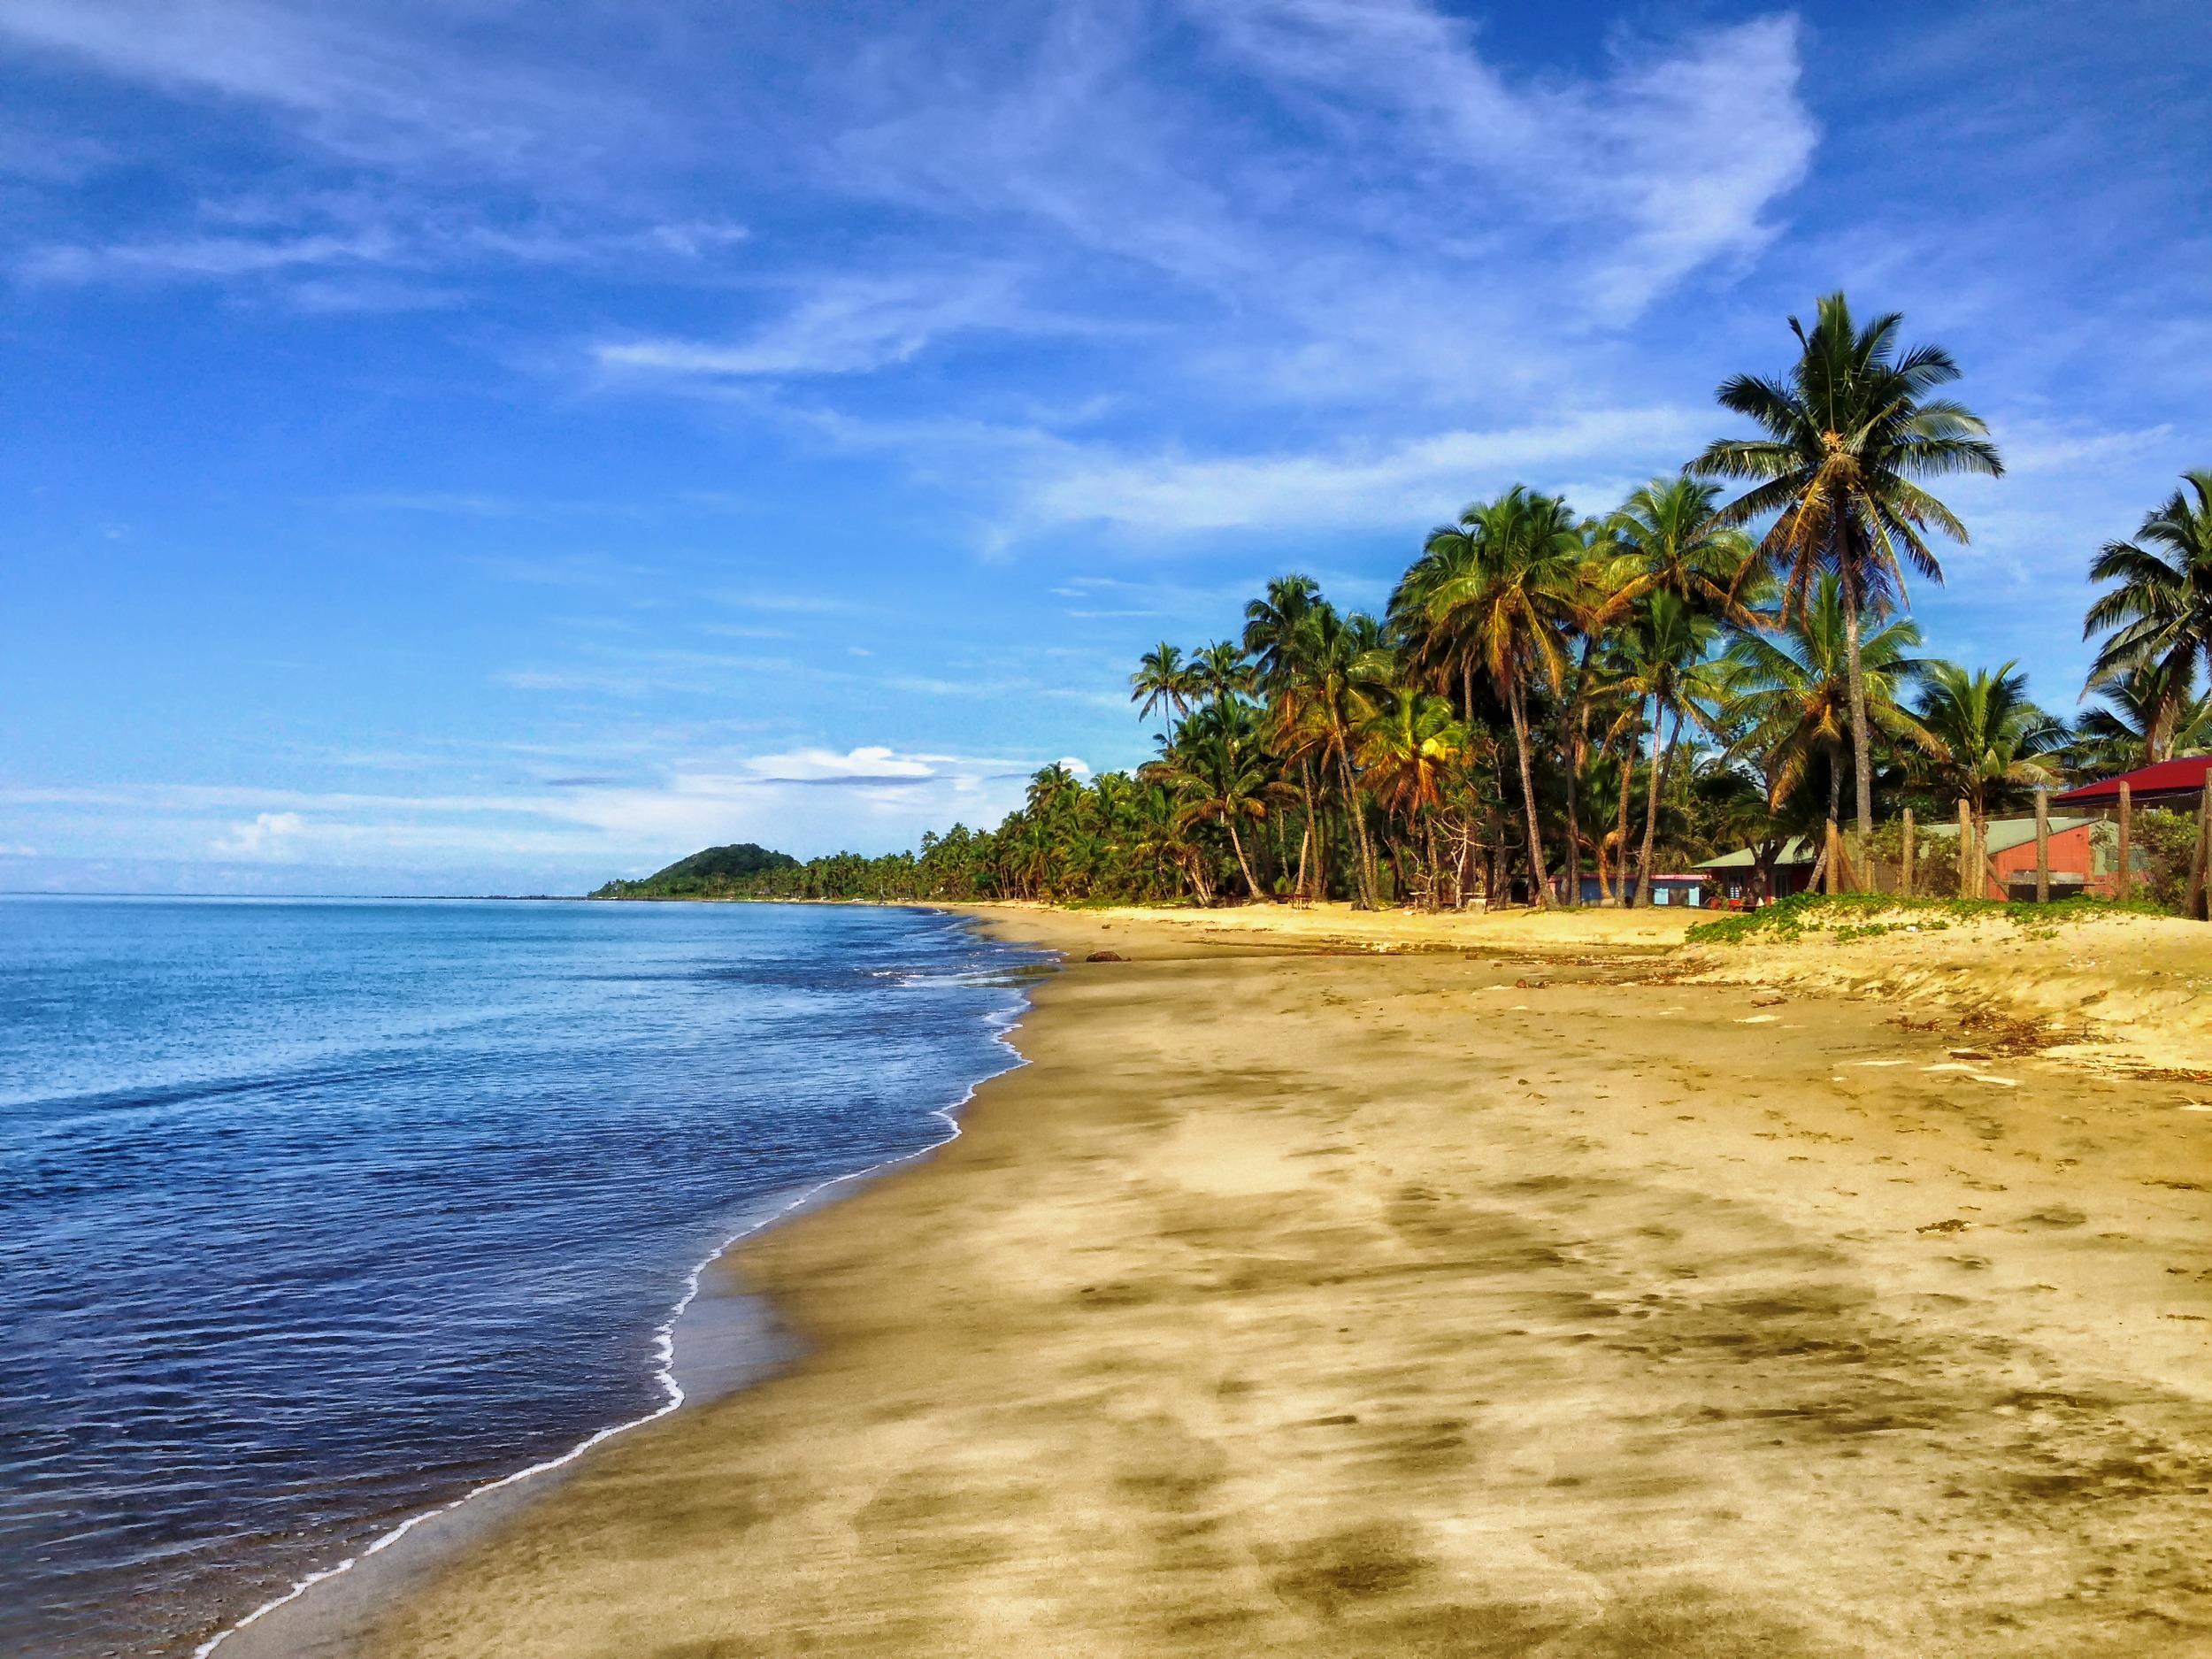 free images : beach, sea, coast, nature, sand, ocean, horizon, sky